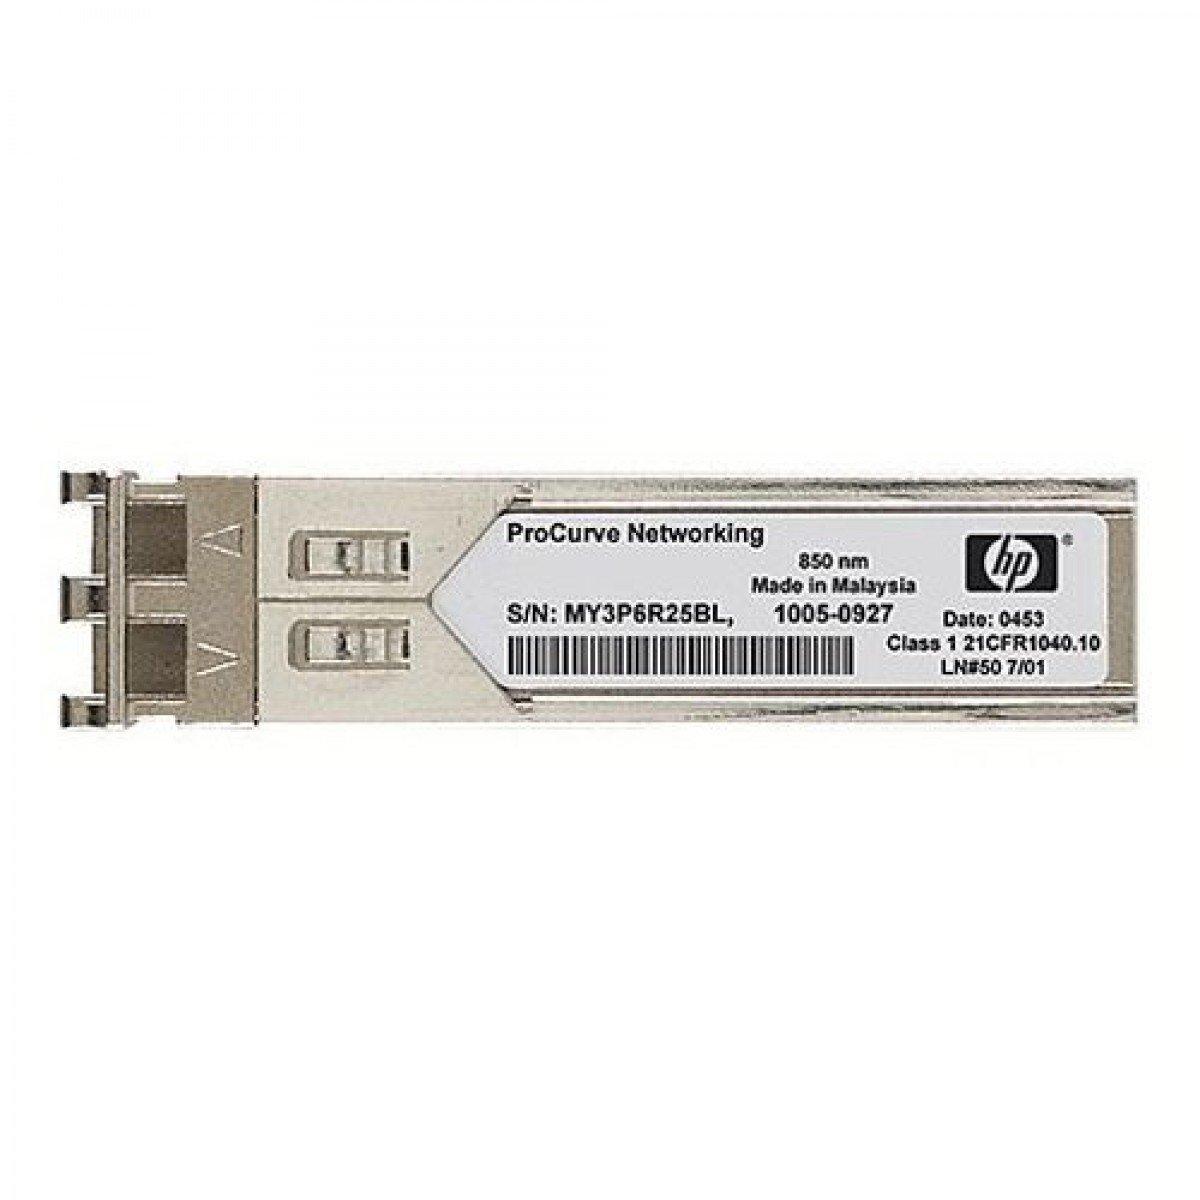 Hewlett-Packard ProCurve J4859C Gigabit LX-LC Mini GBIC Transceiver Module